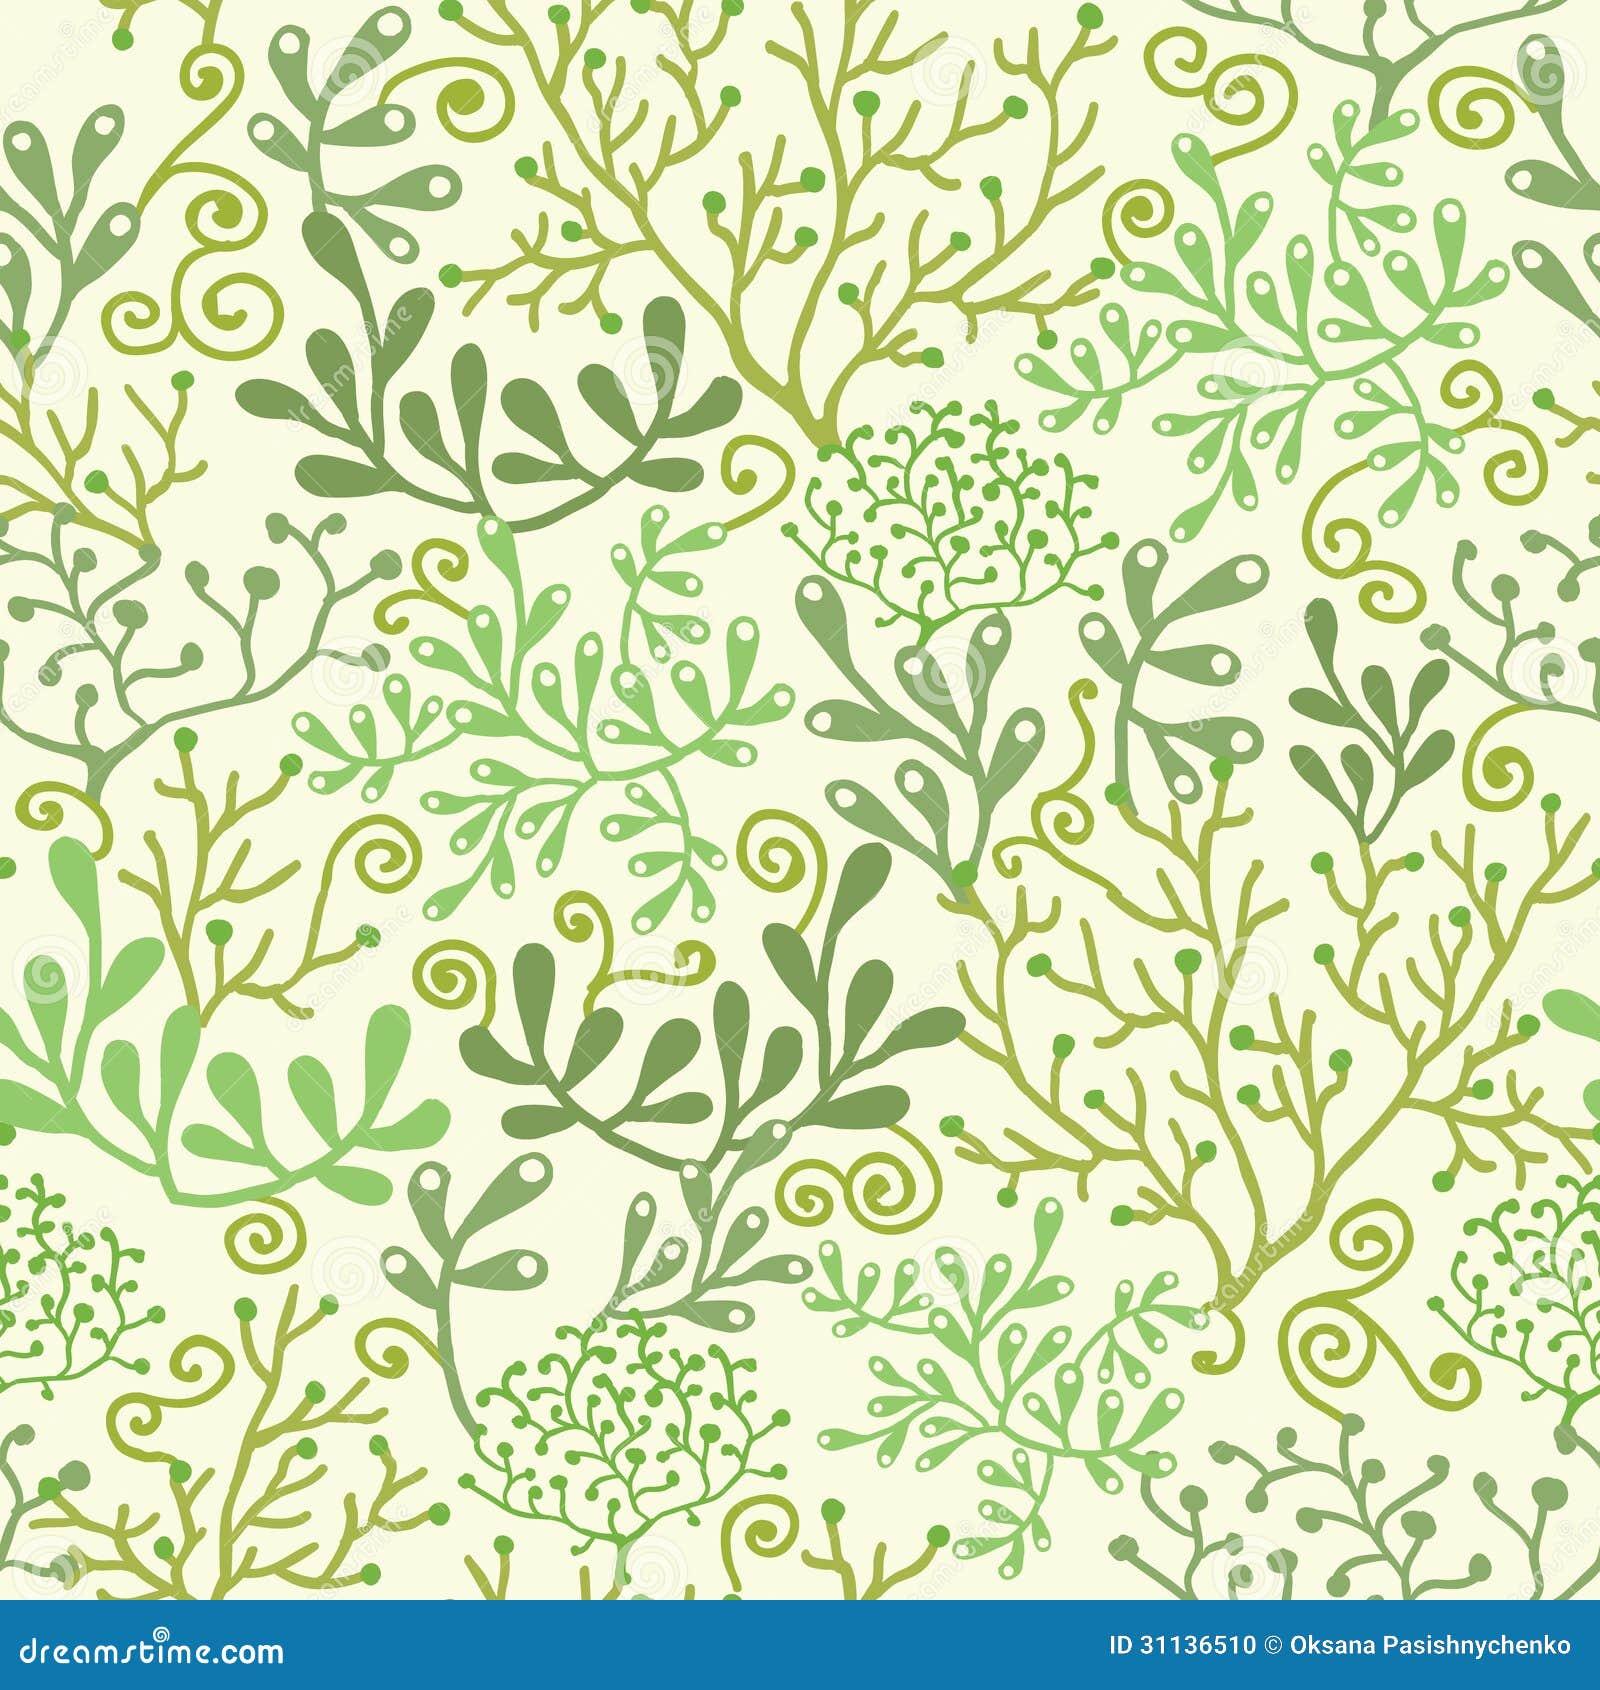 underwater seaweed garden seamless pattern stock vector seaweed vector outline seaweed vector download